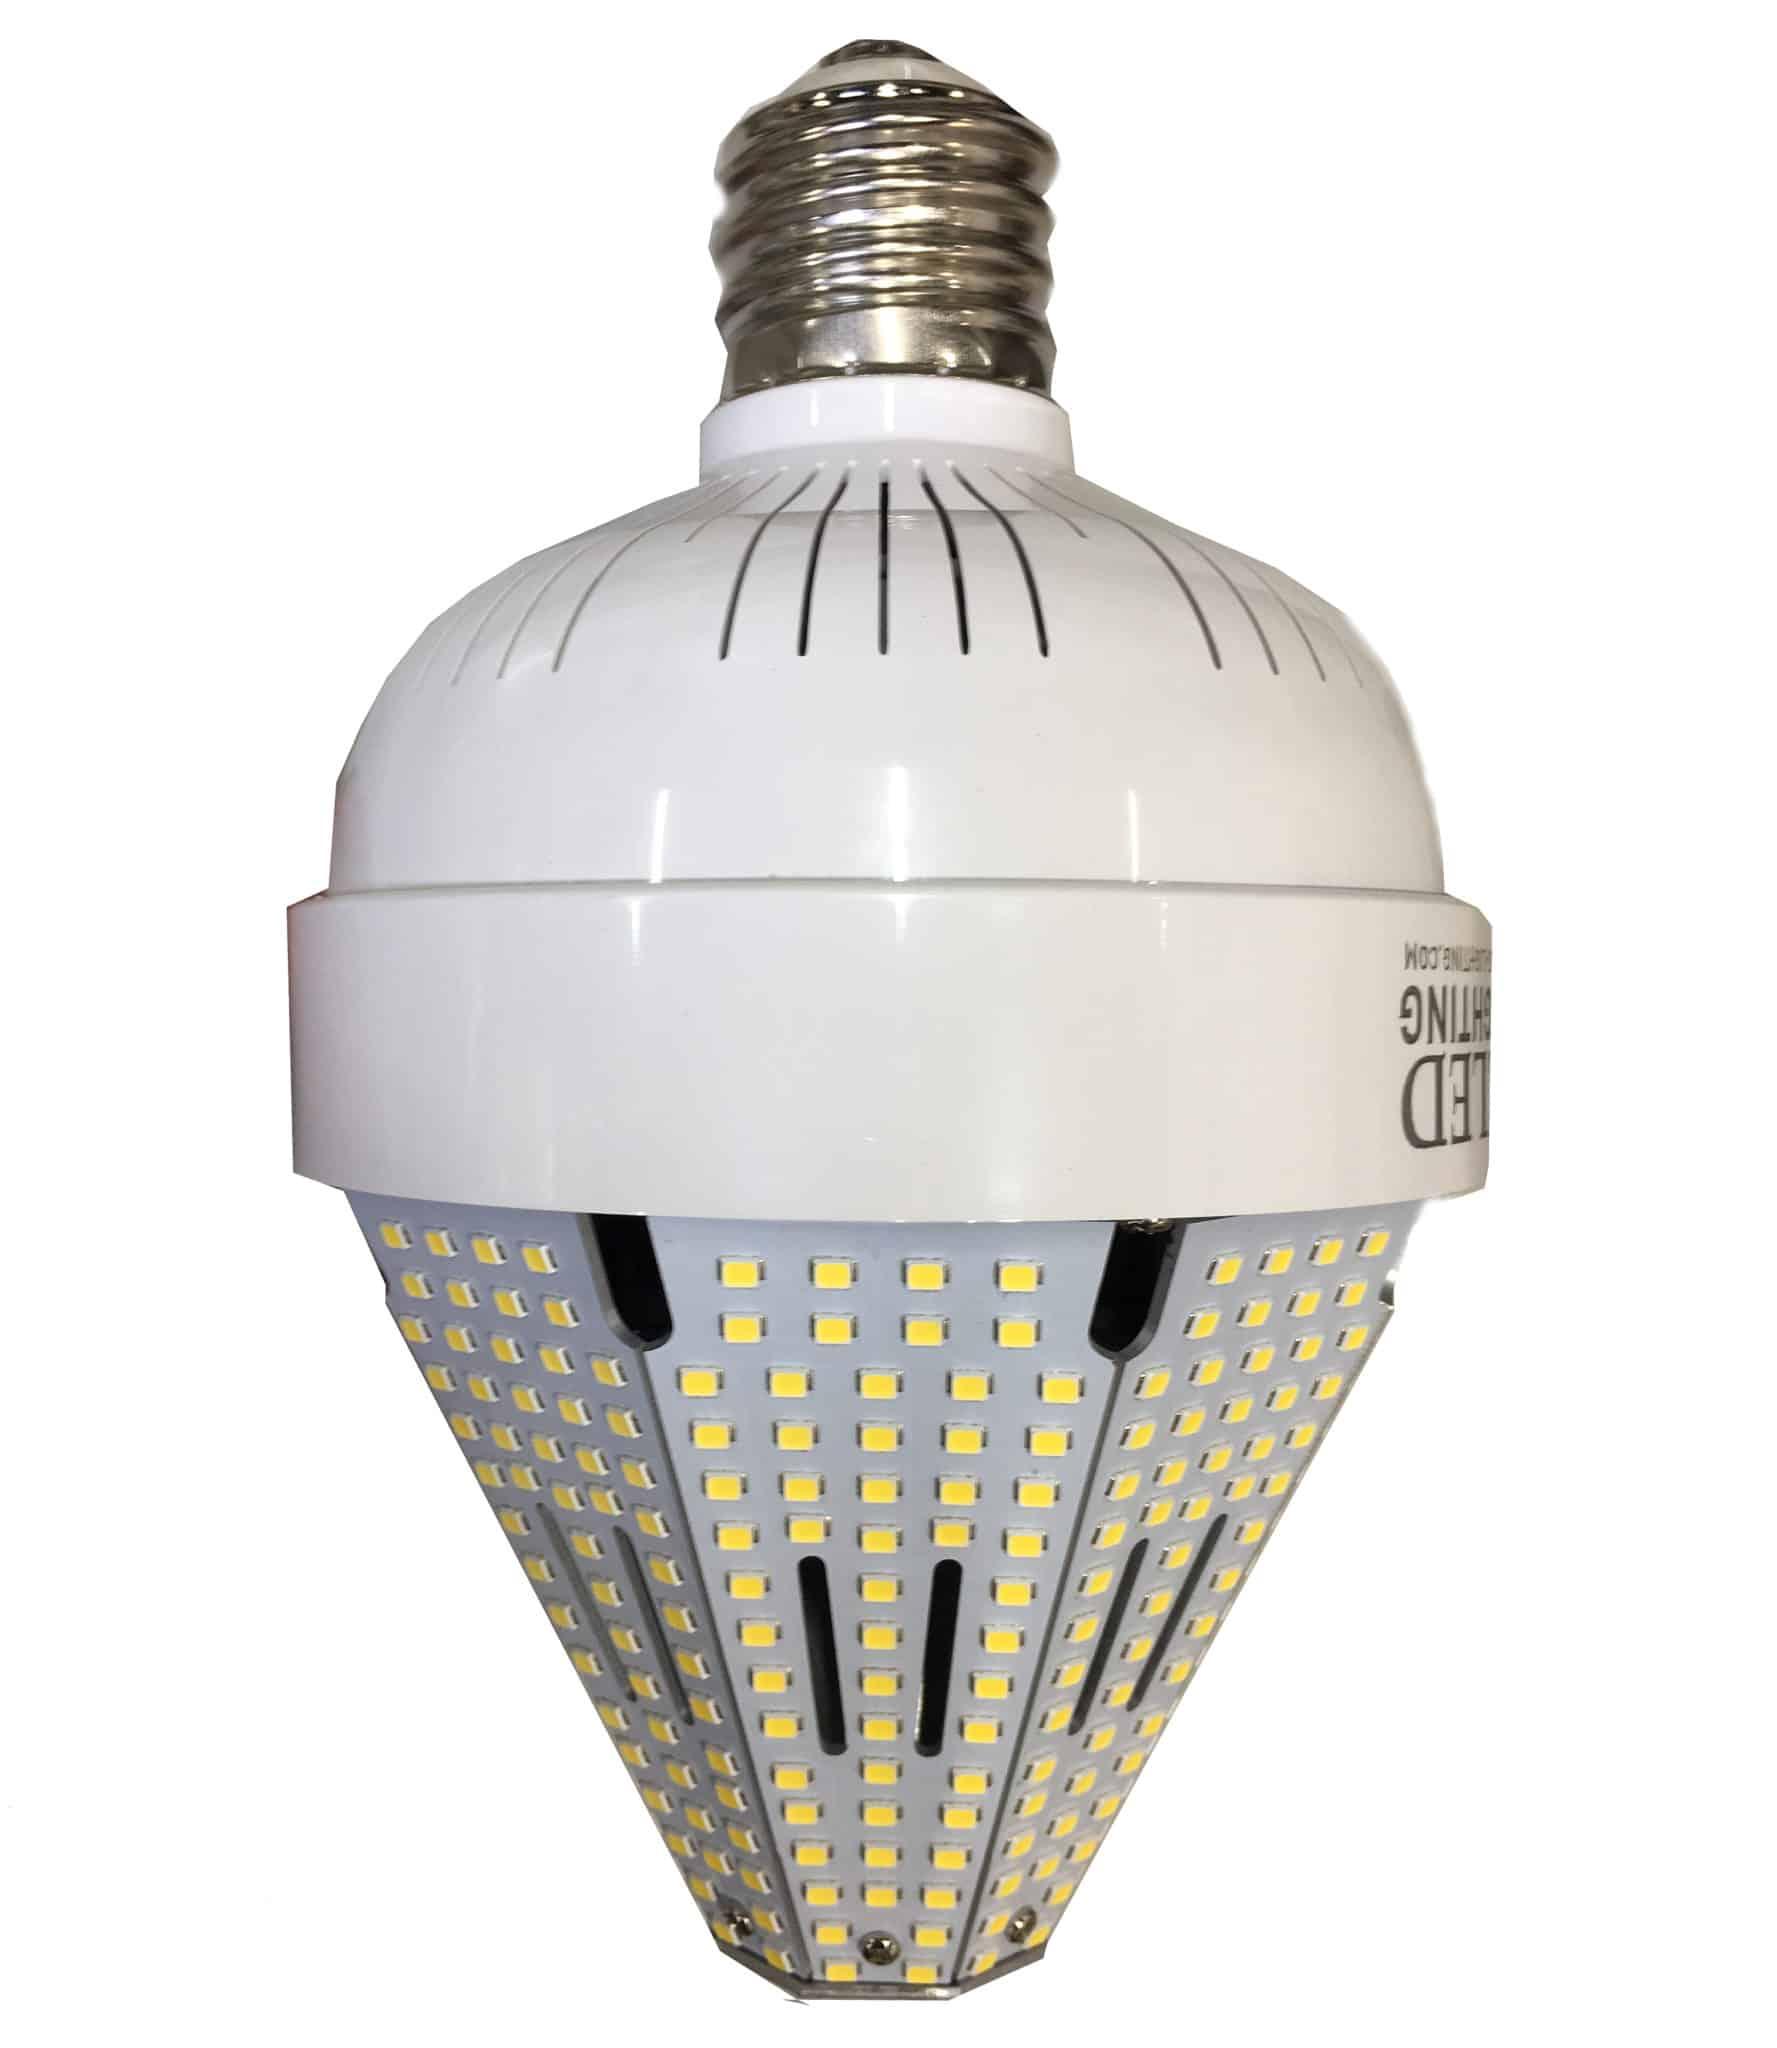 Pyramid Corn Lamps